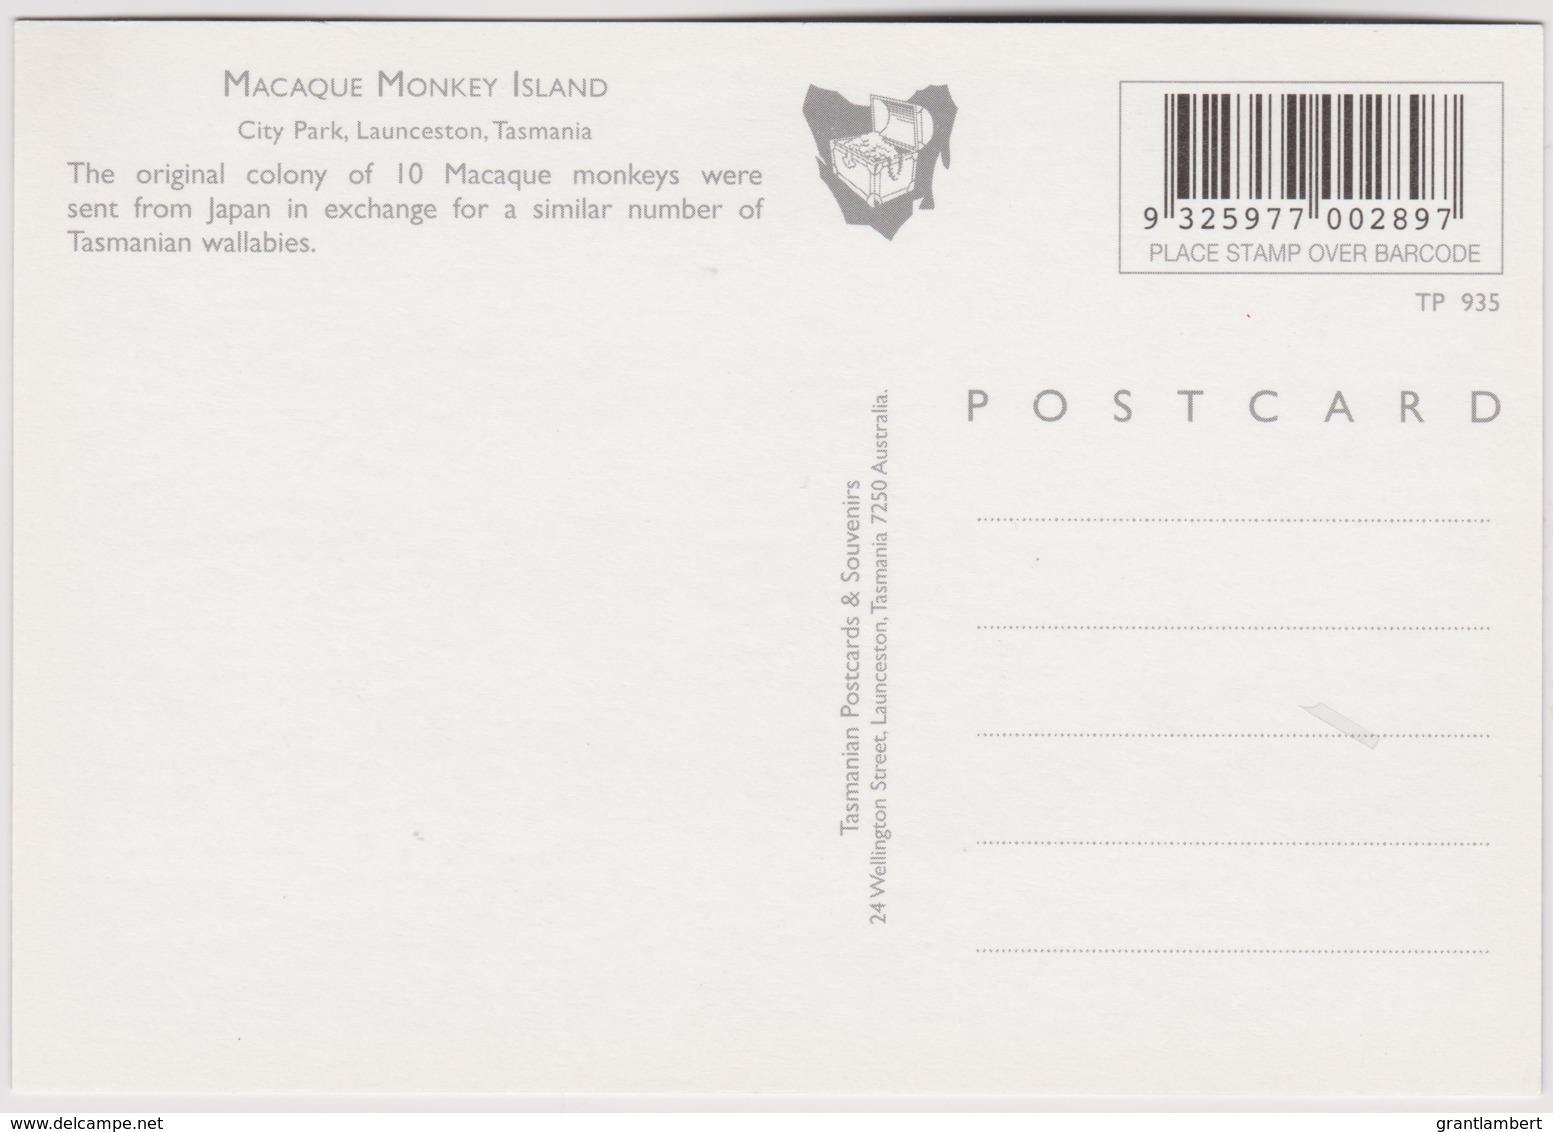 Macaque Monkey Island, City Park, Launceston, Tasmania - Unused - Lauceston